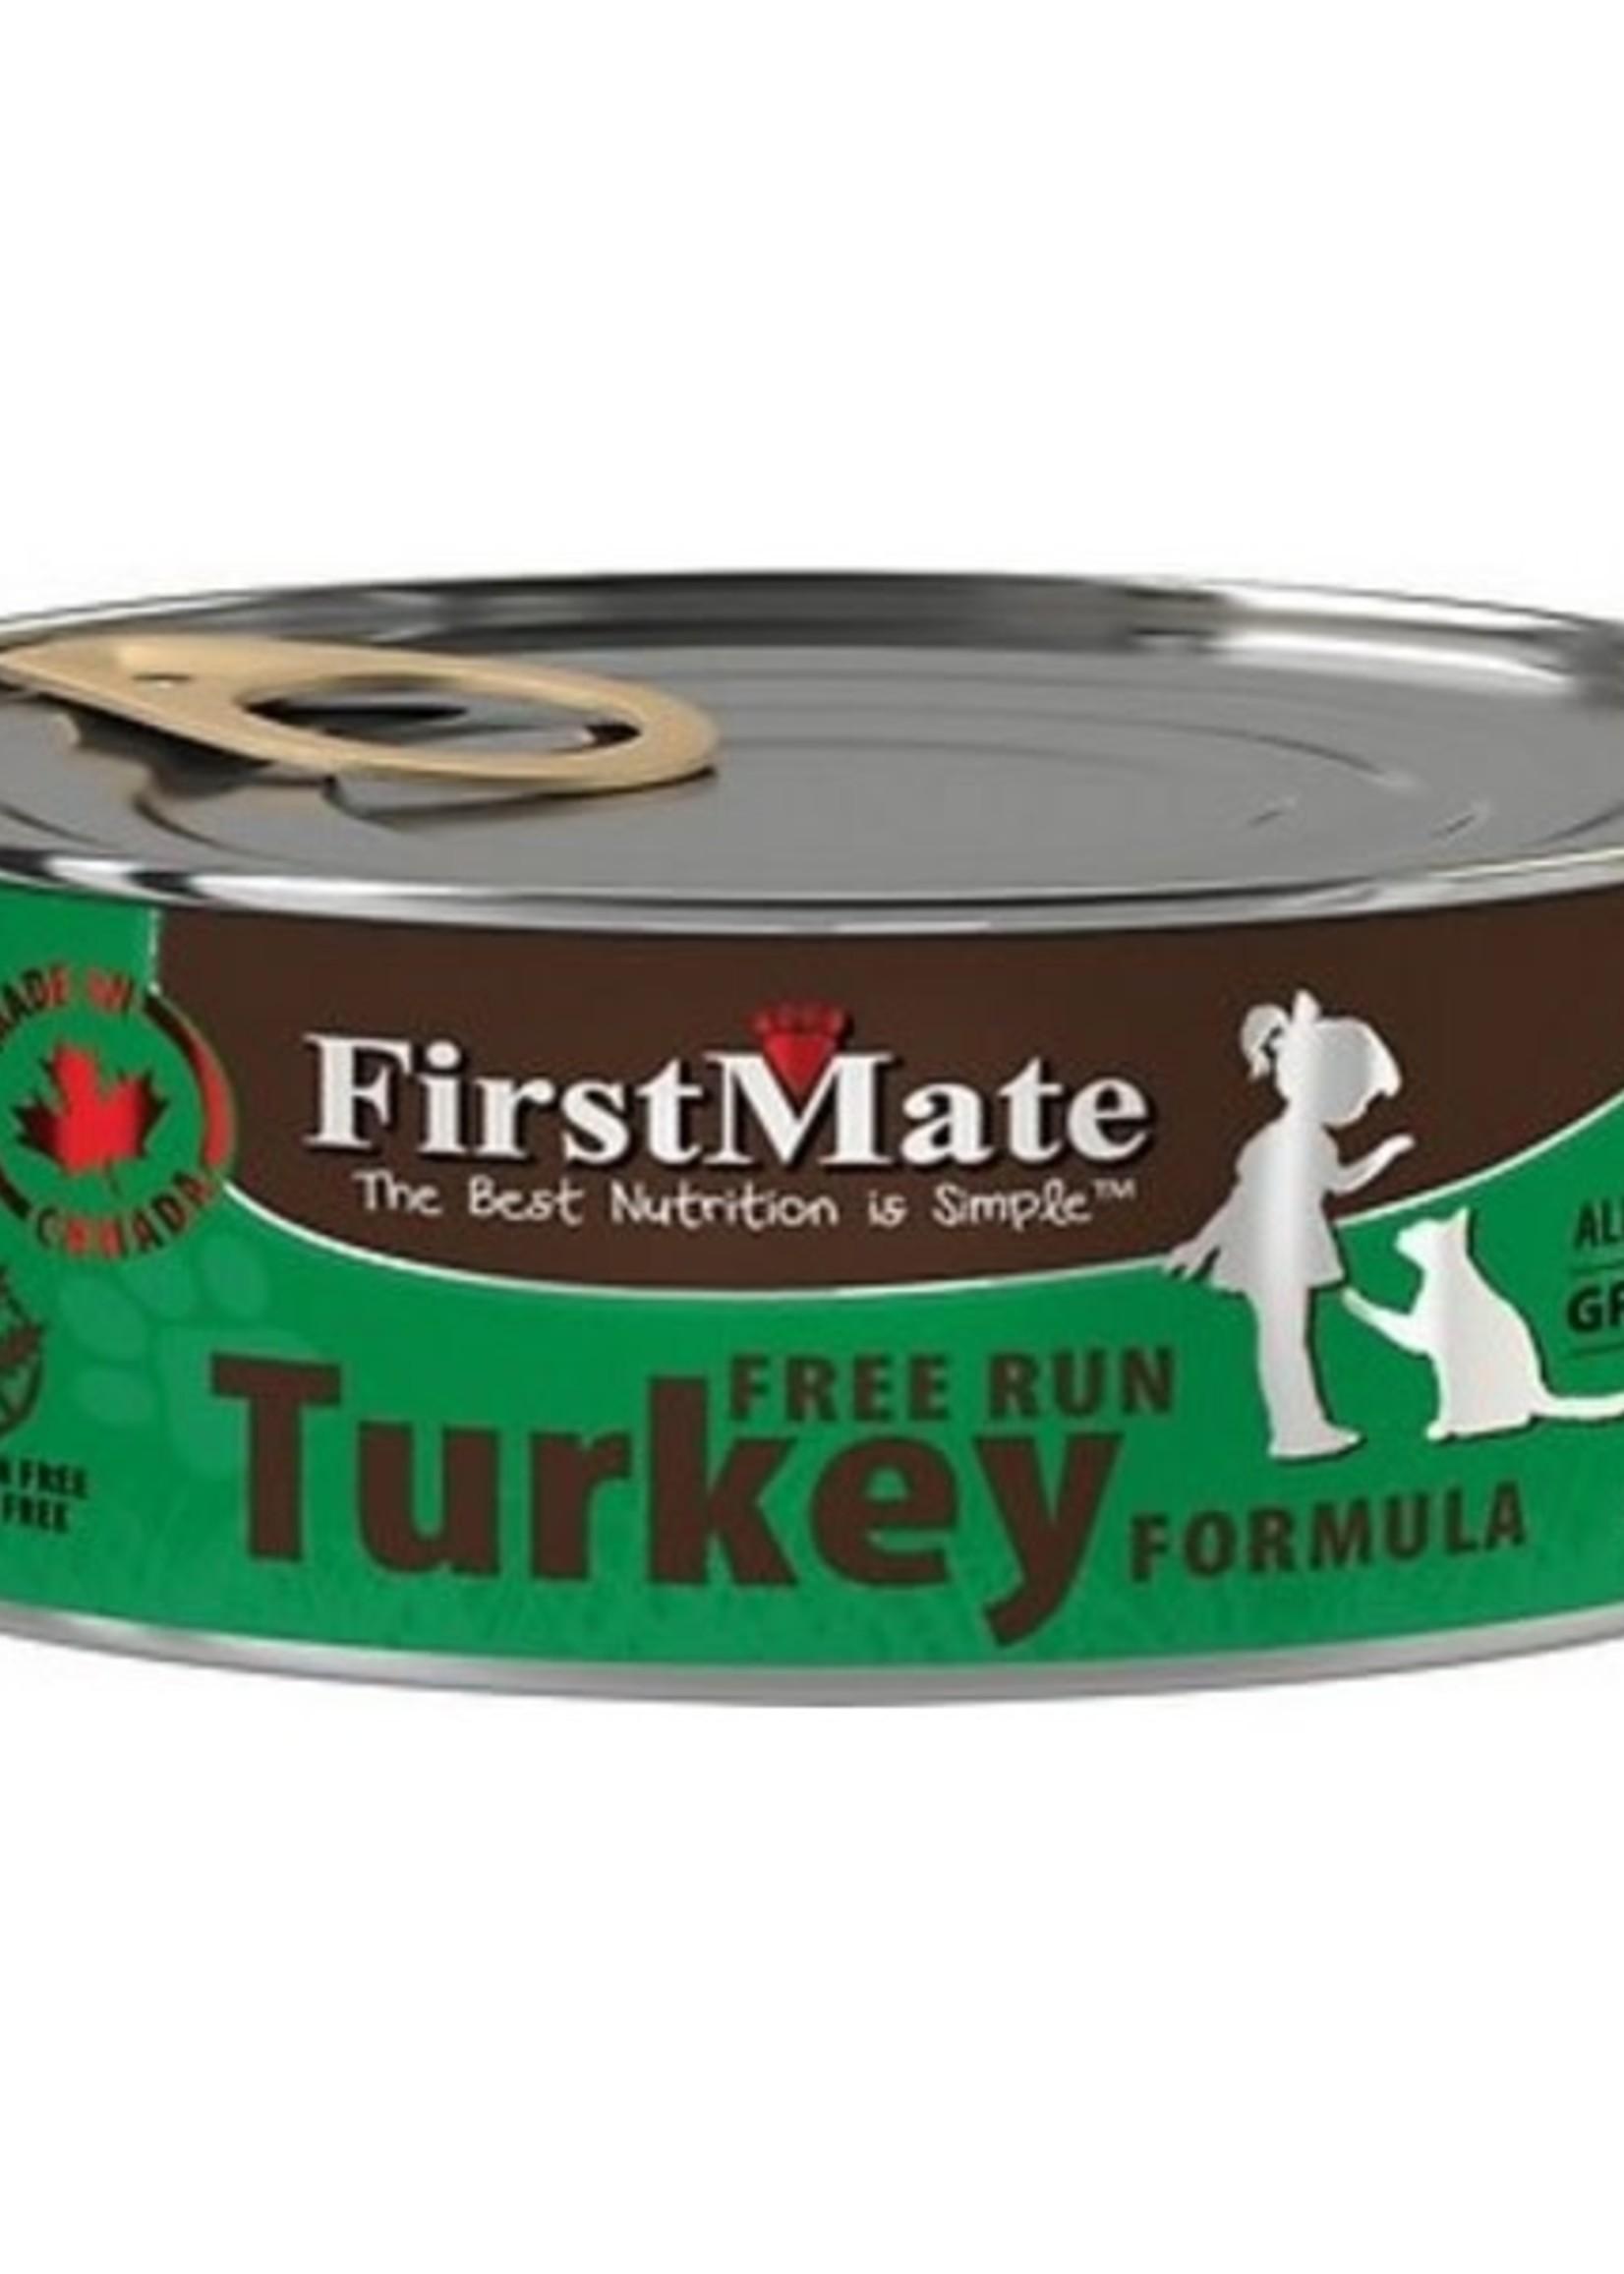 First Mate First Mate Free Run Turkey CAT-5.5oz